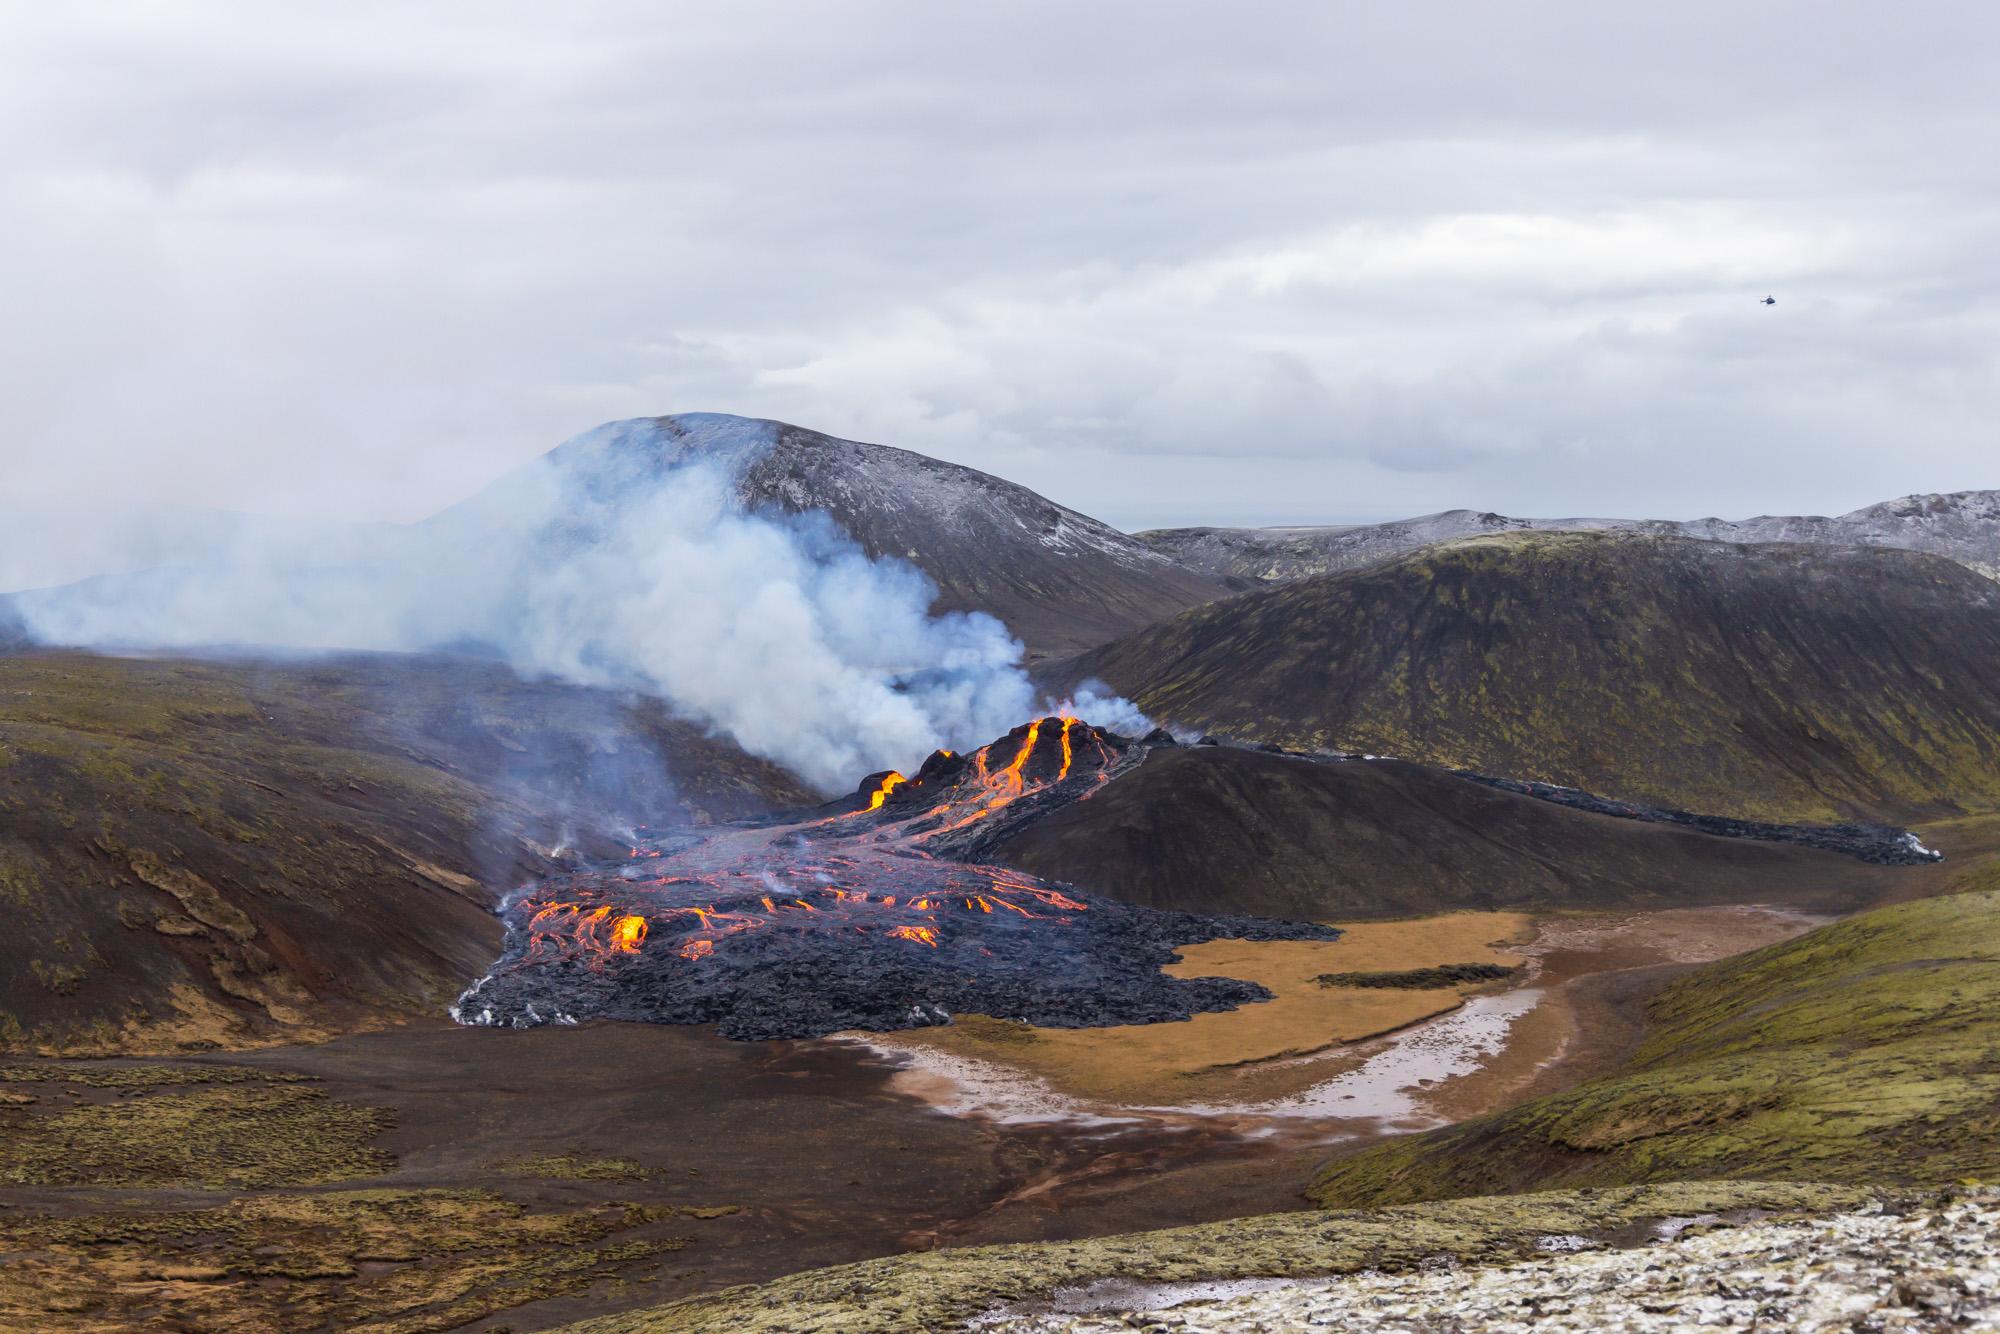 Volcanic_eruption_2021_2_vilhelmgunnarsson.jpg